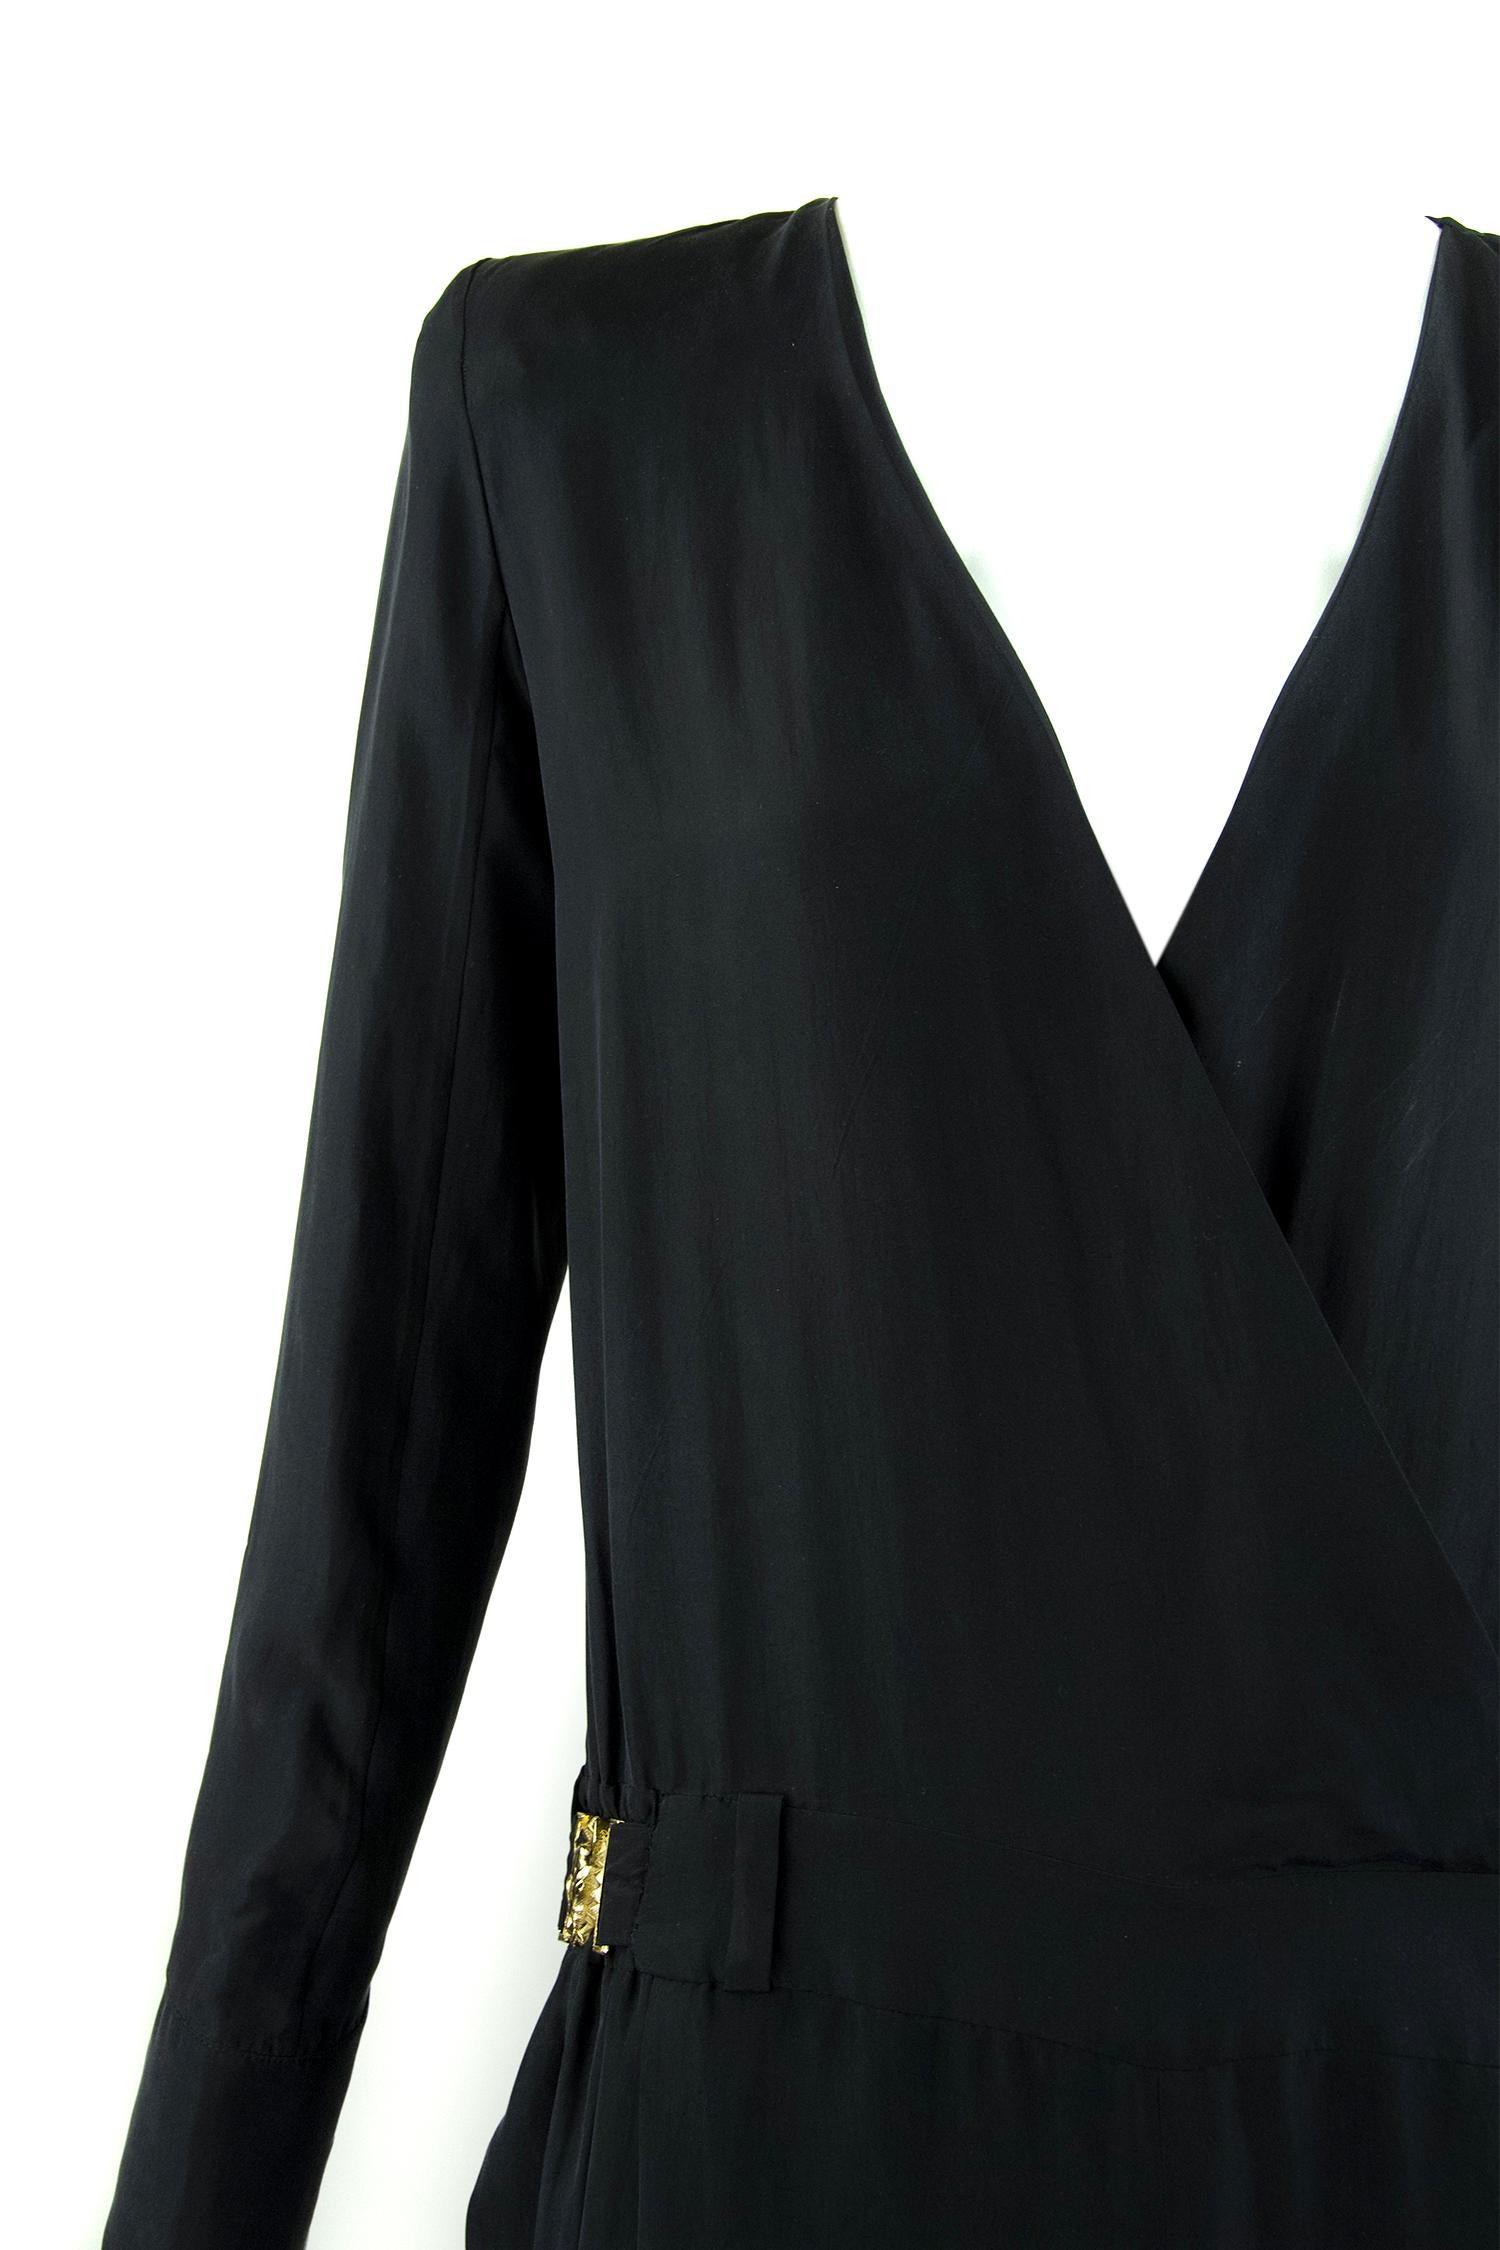 c02581f21157 Balmain Silk Long Sleeve Jumpsuit - Size FR 34 For Sale at 1stdibs